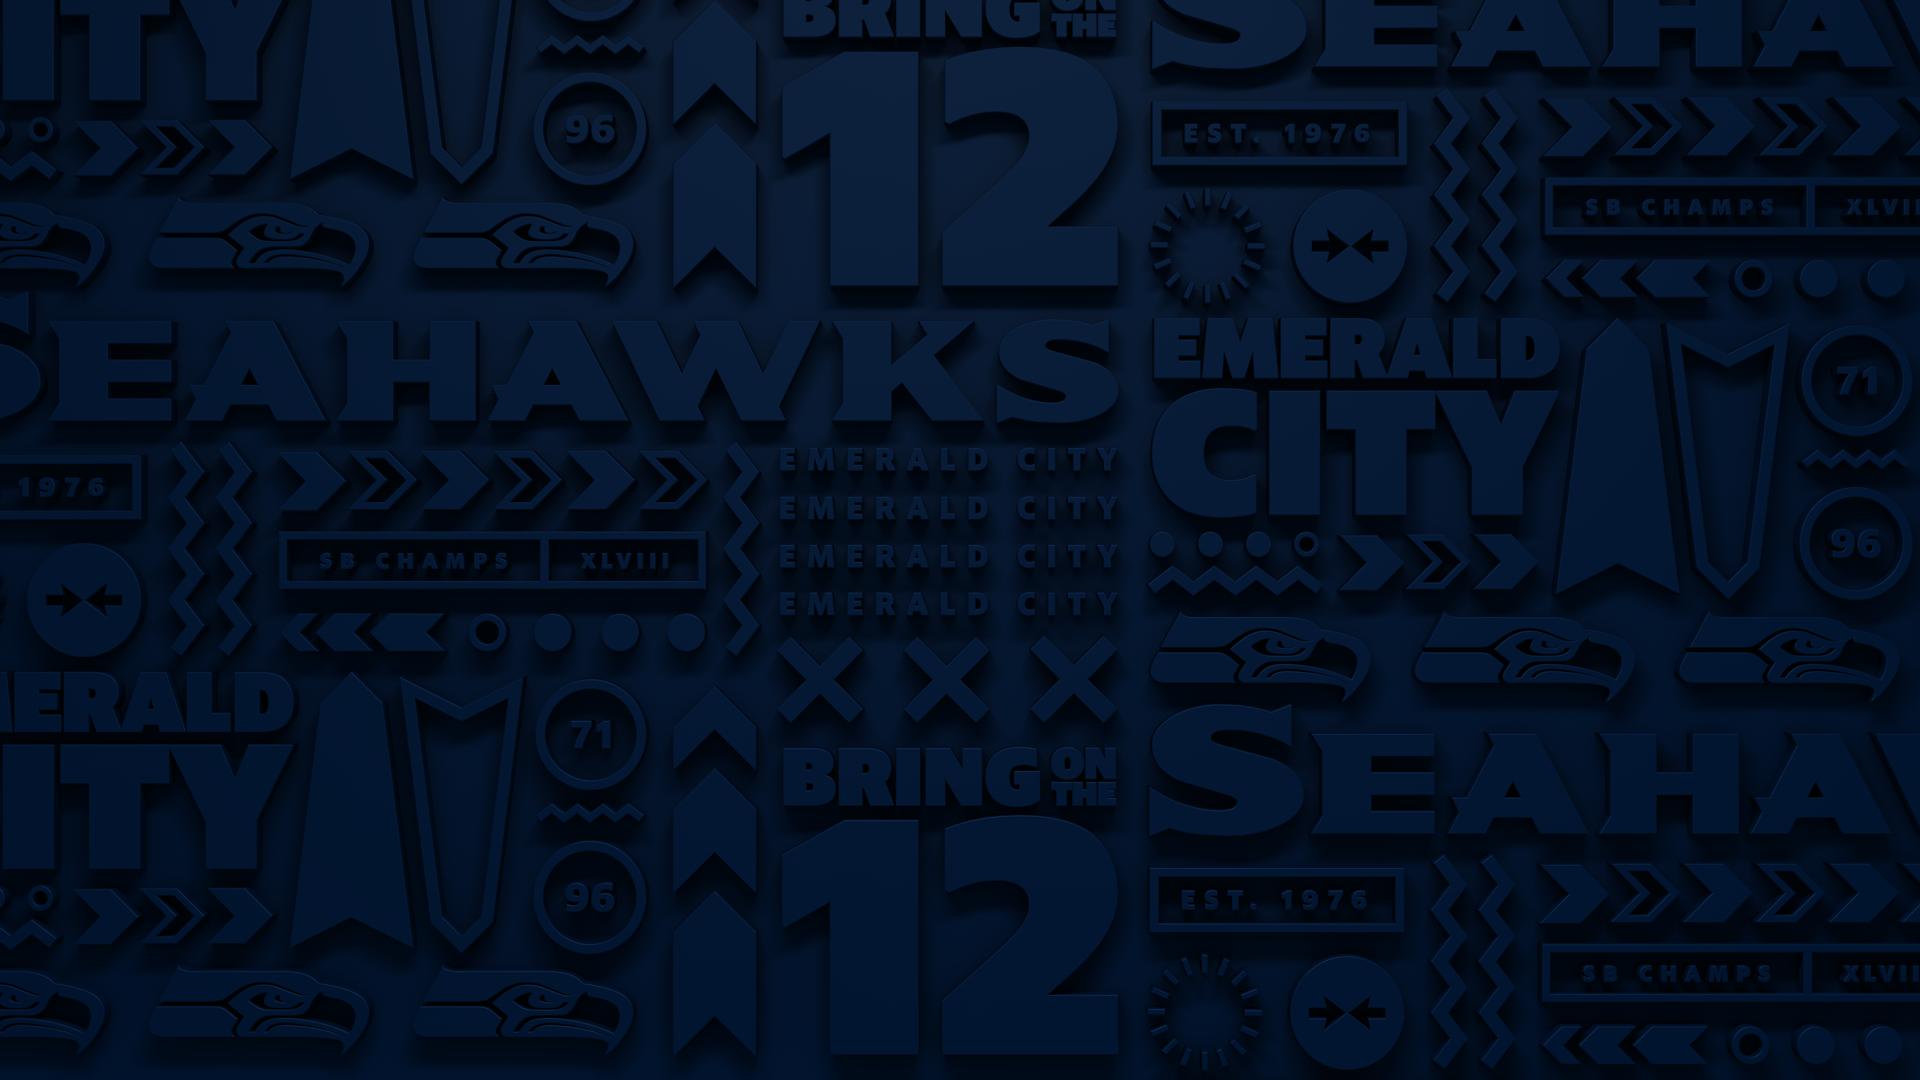 SEA_Seahawks_BKG.png